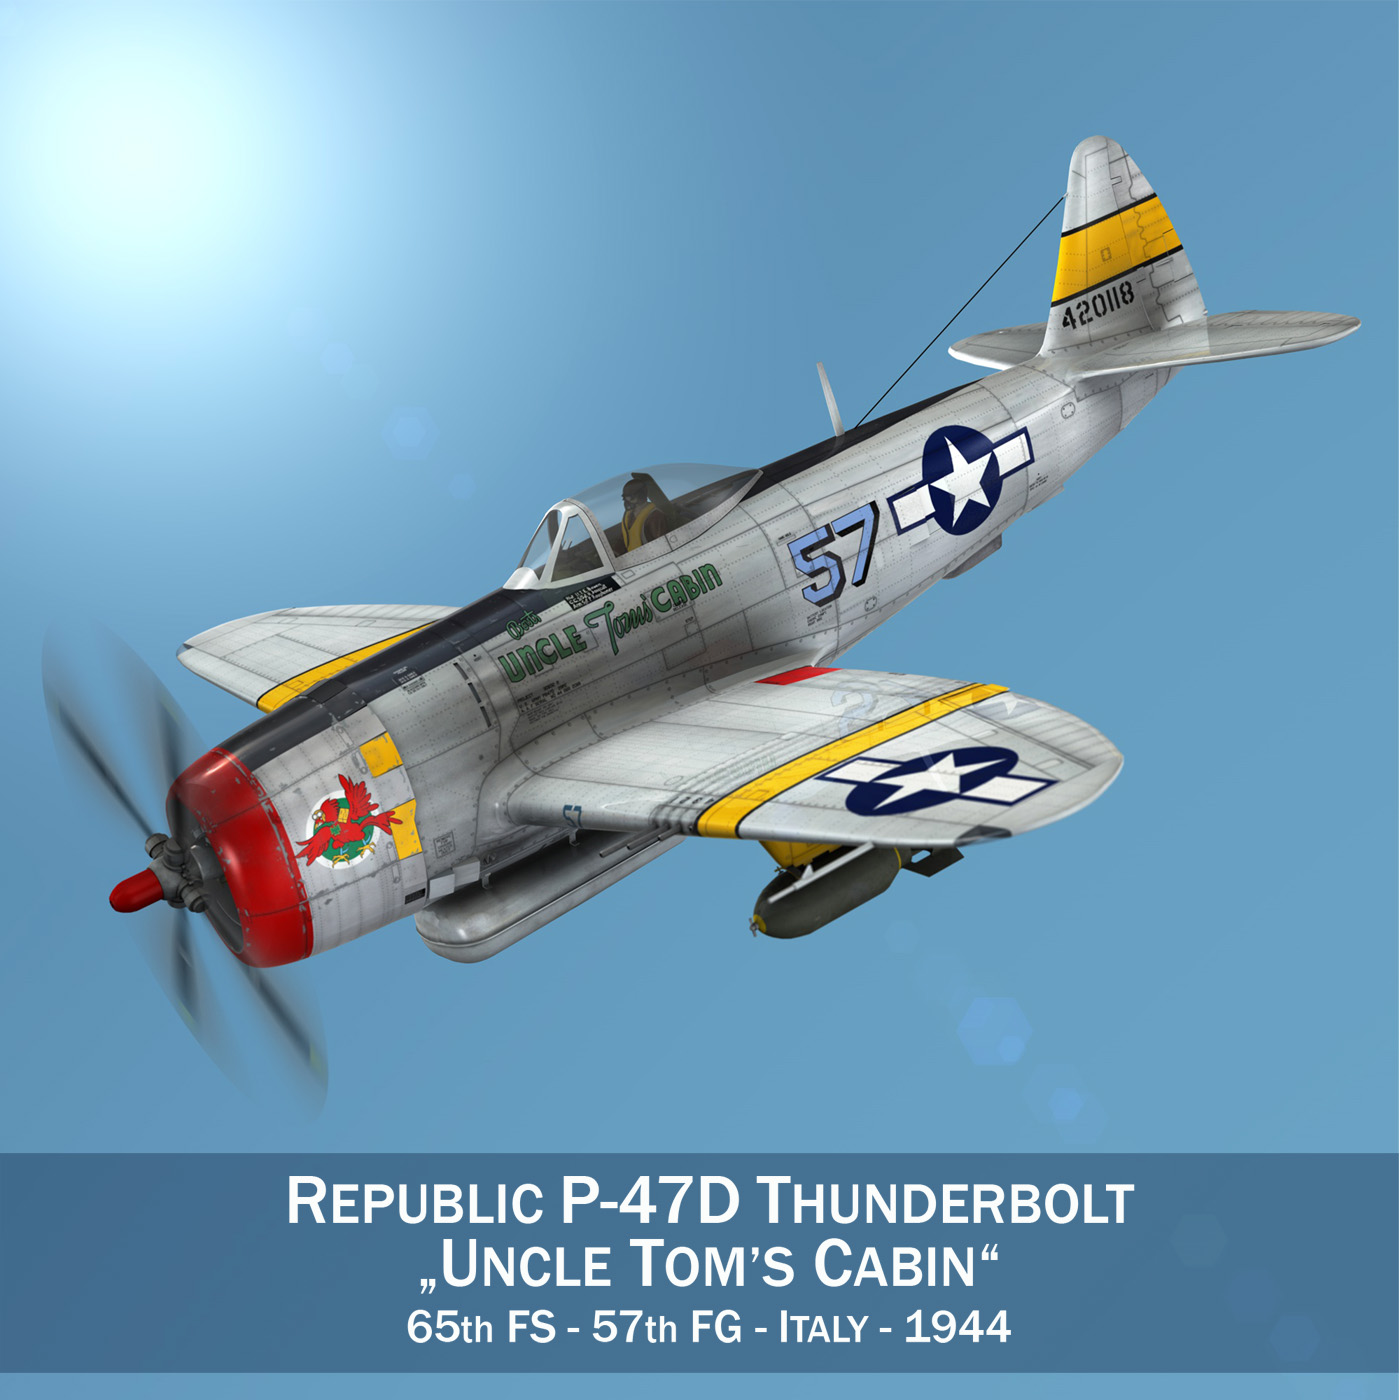 republika p-47d pērkons - tēvocis salons 3d modelis 3ds c4d fbx lwo lws objekts 266145